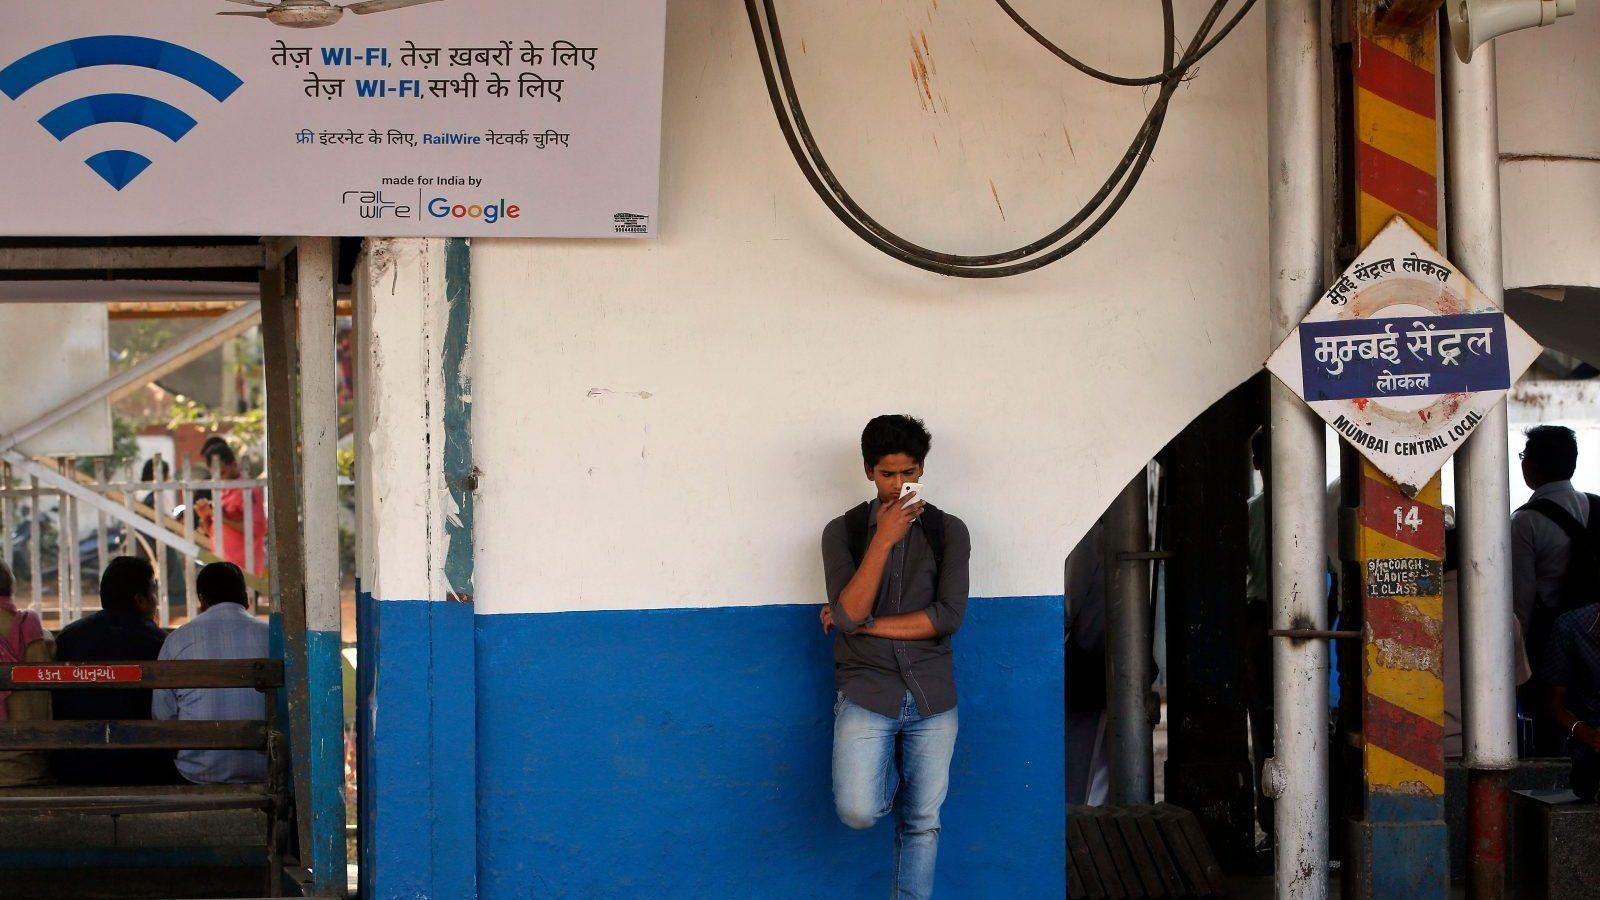 India-google-wifi-railways